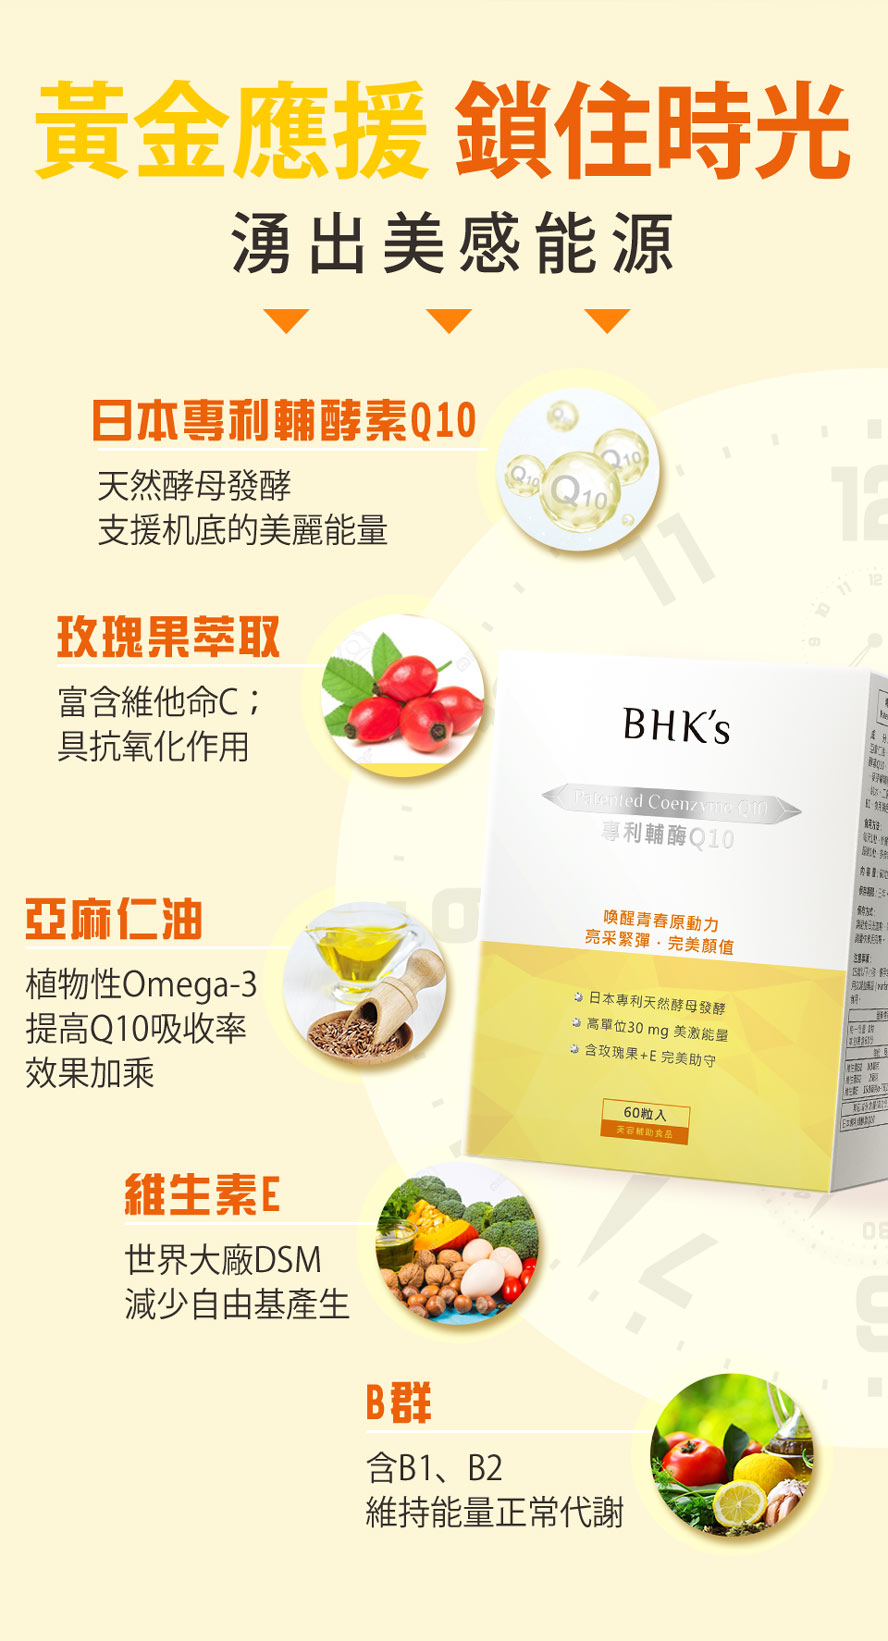 BHK'sBHK's輔酶Q10+E使用日本專利天然酵母發酵,支援肌底美麗